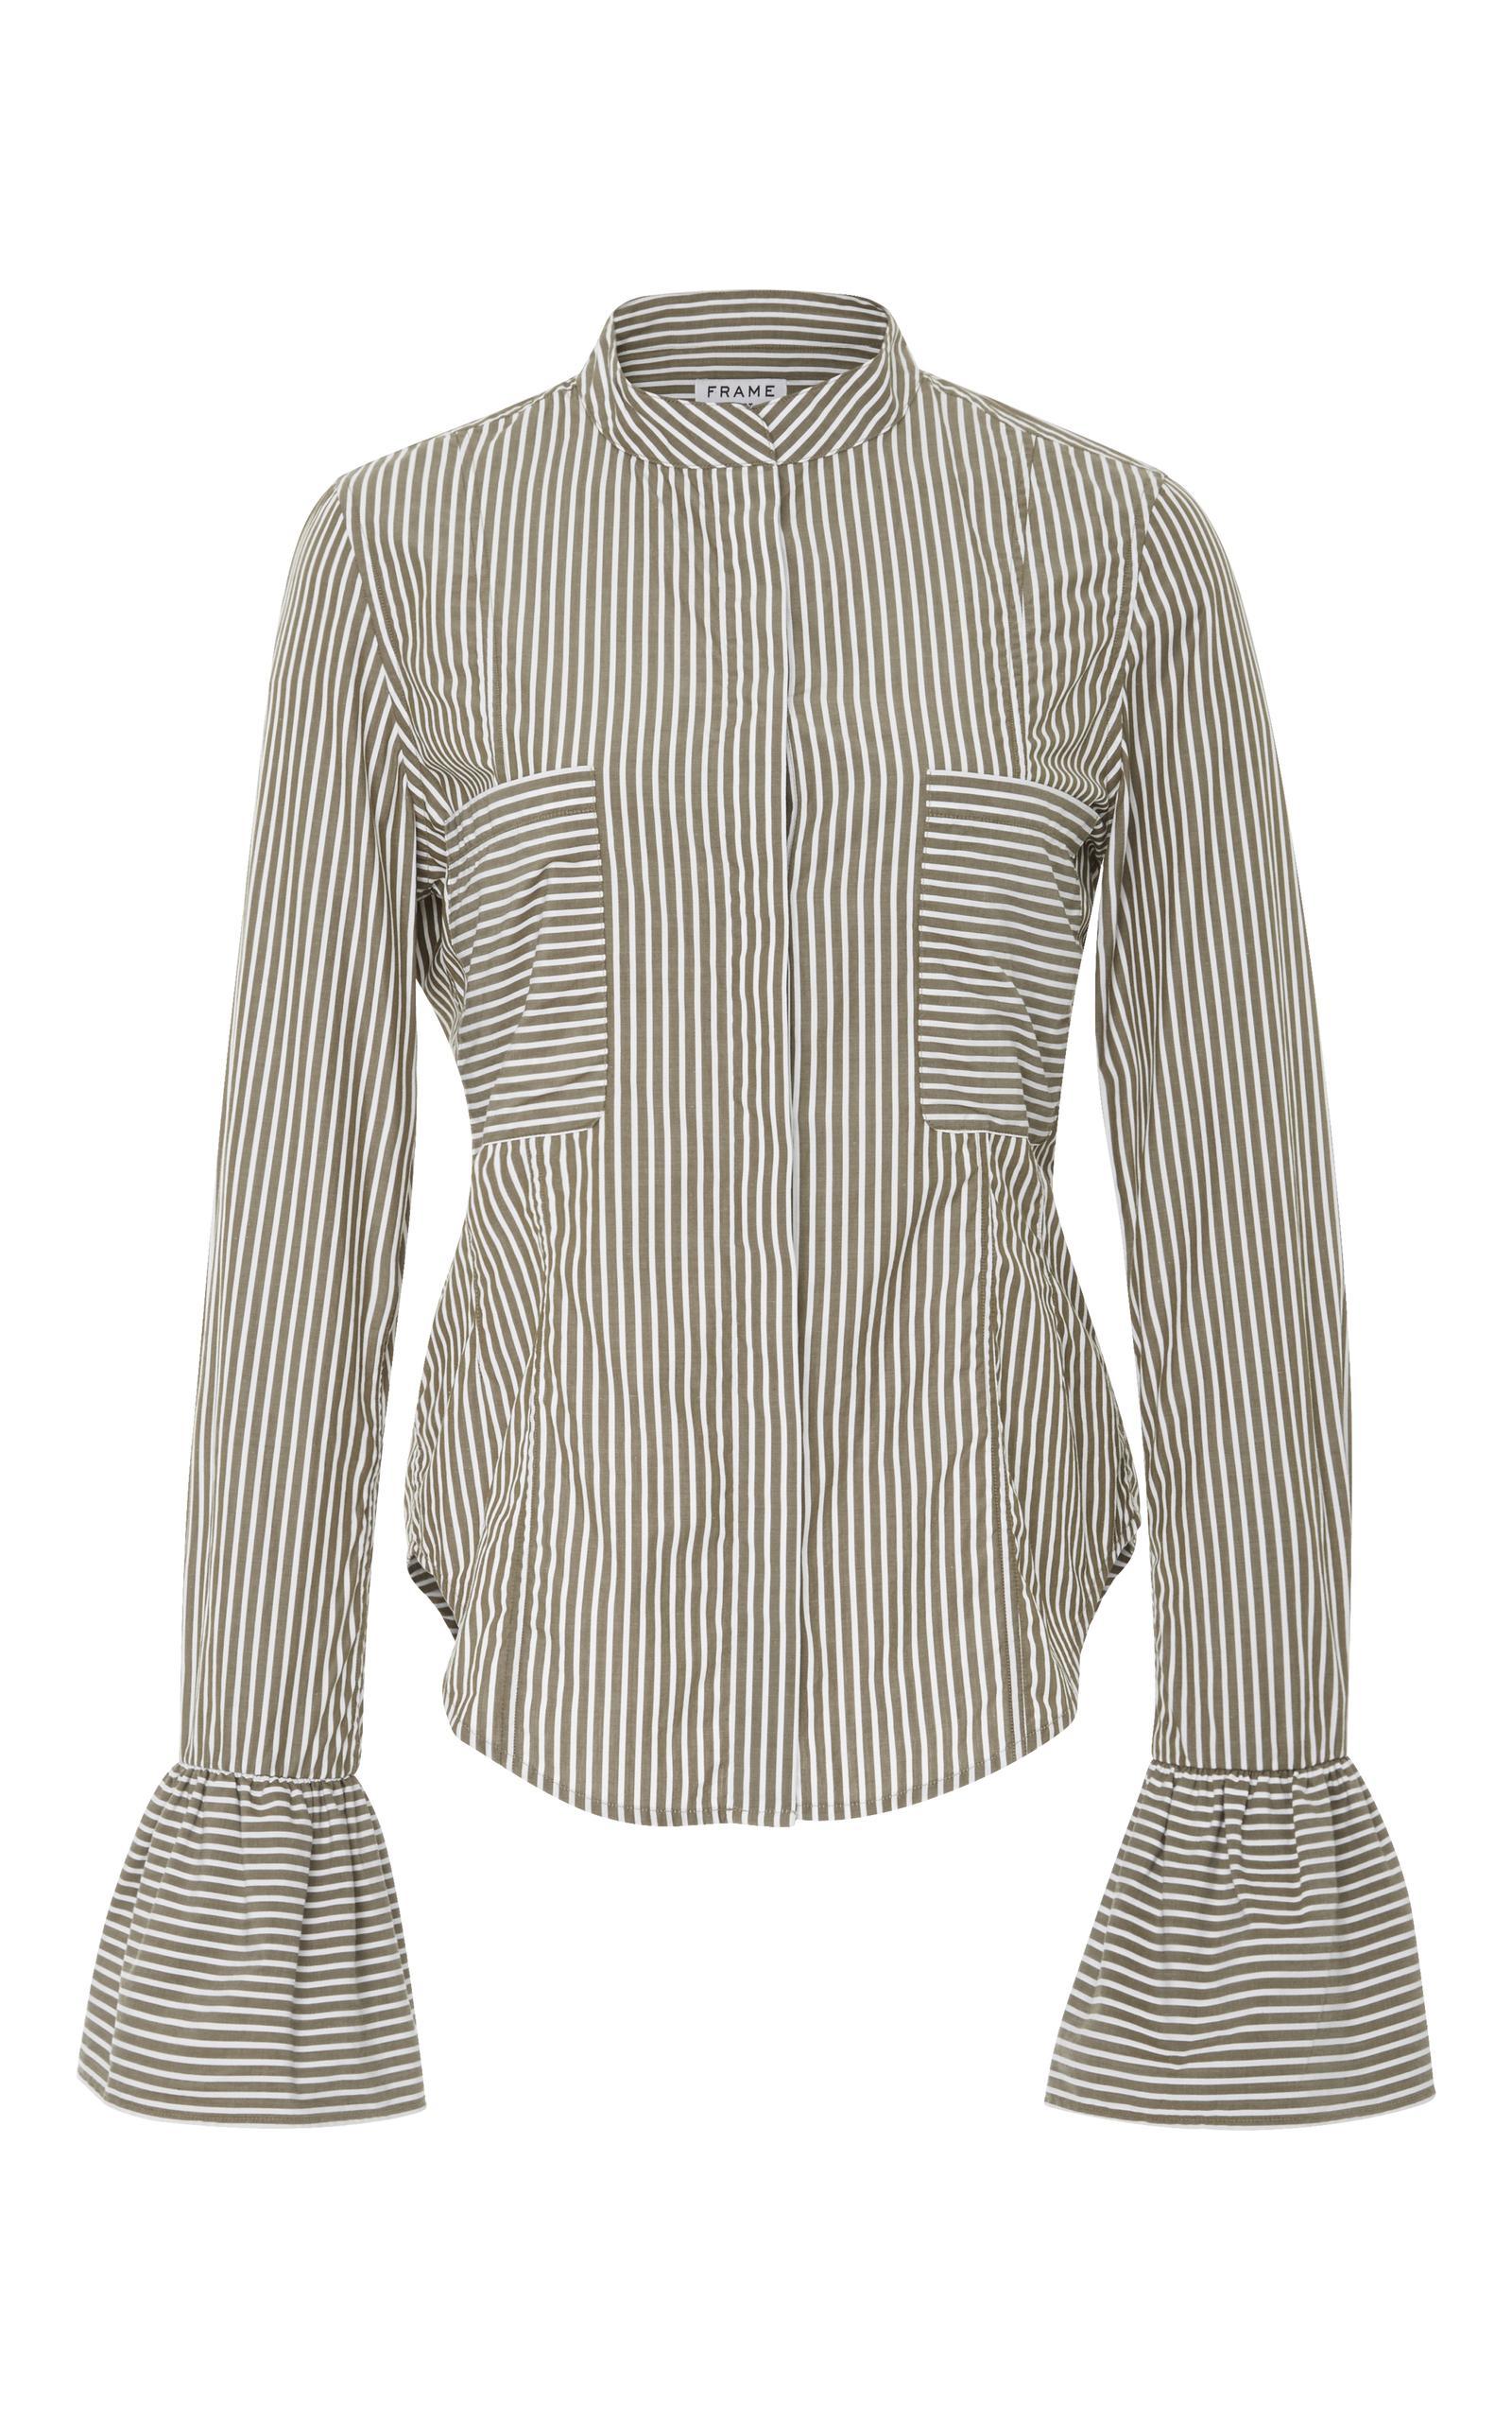 Frame Striped Cotton-poplin Shirt In Sage Multi